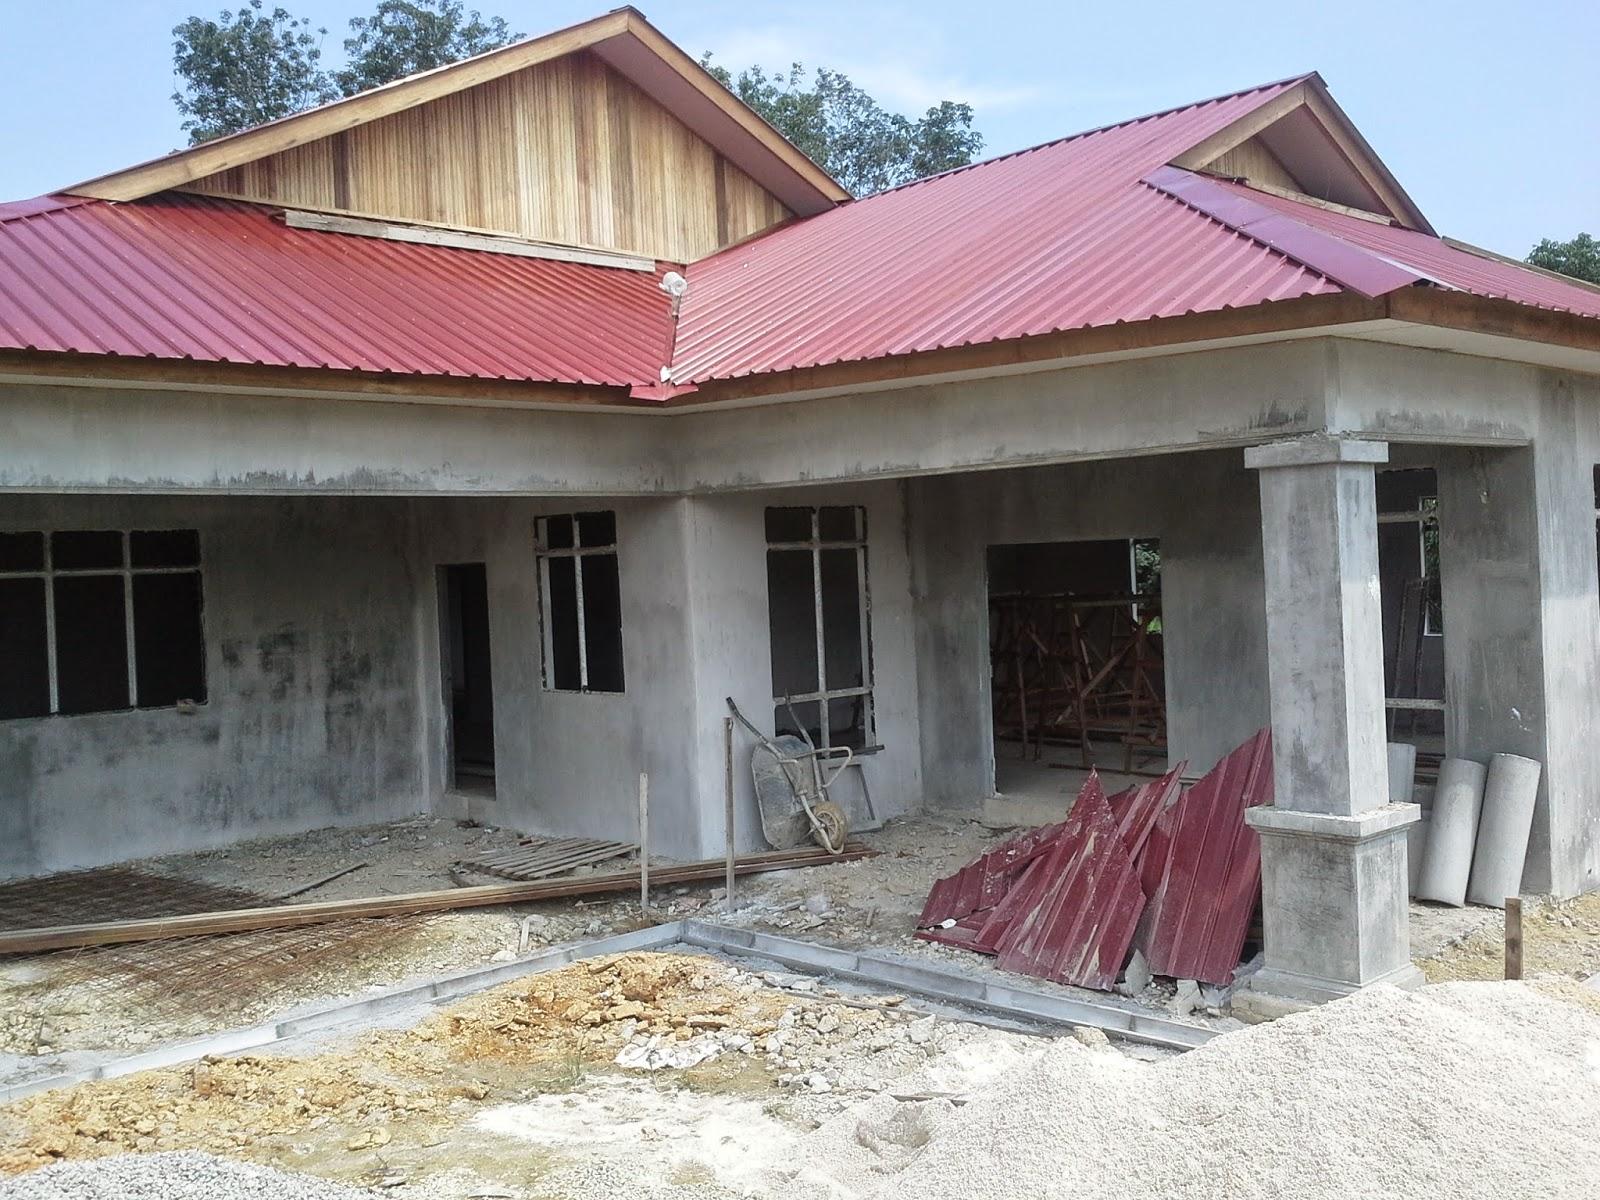 Kontraktor Binaan Bina Dan Ubah Suai Rumah Tukang Rumah Di Johor Projek Dalam Pembinaan